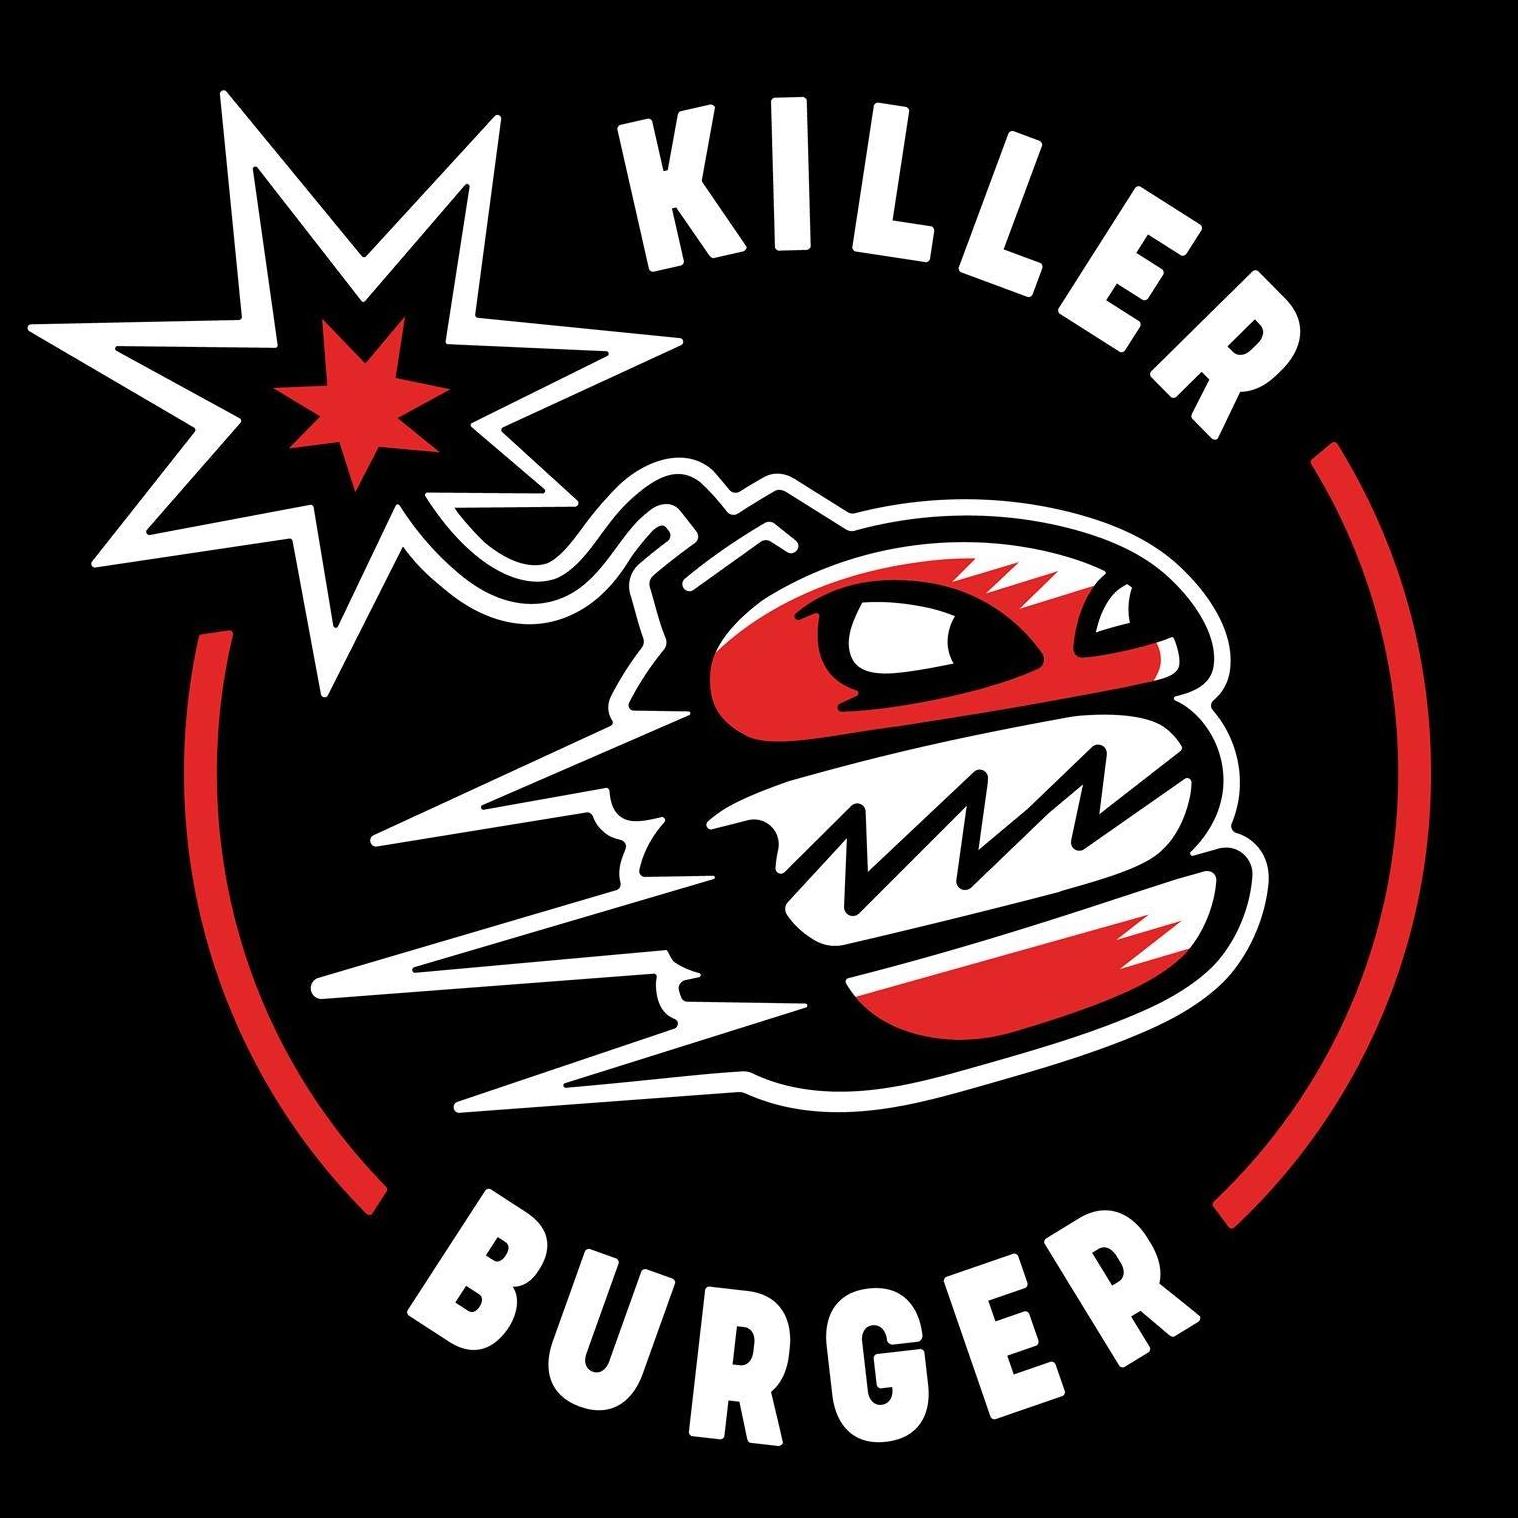 Killer Burger logo